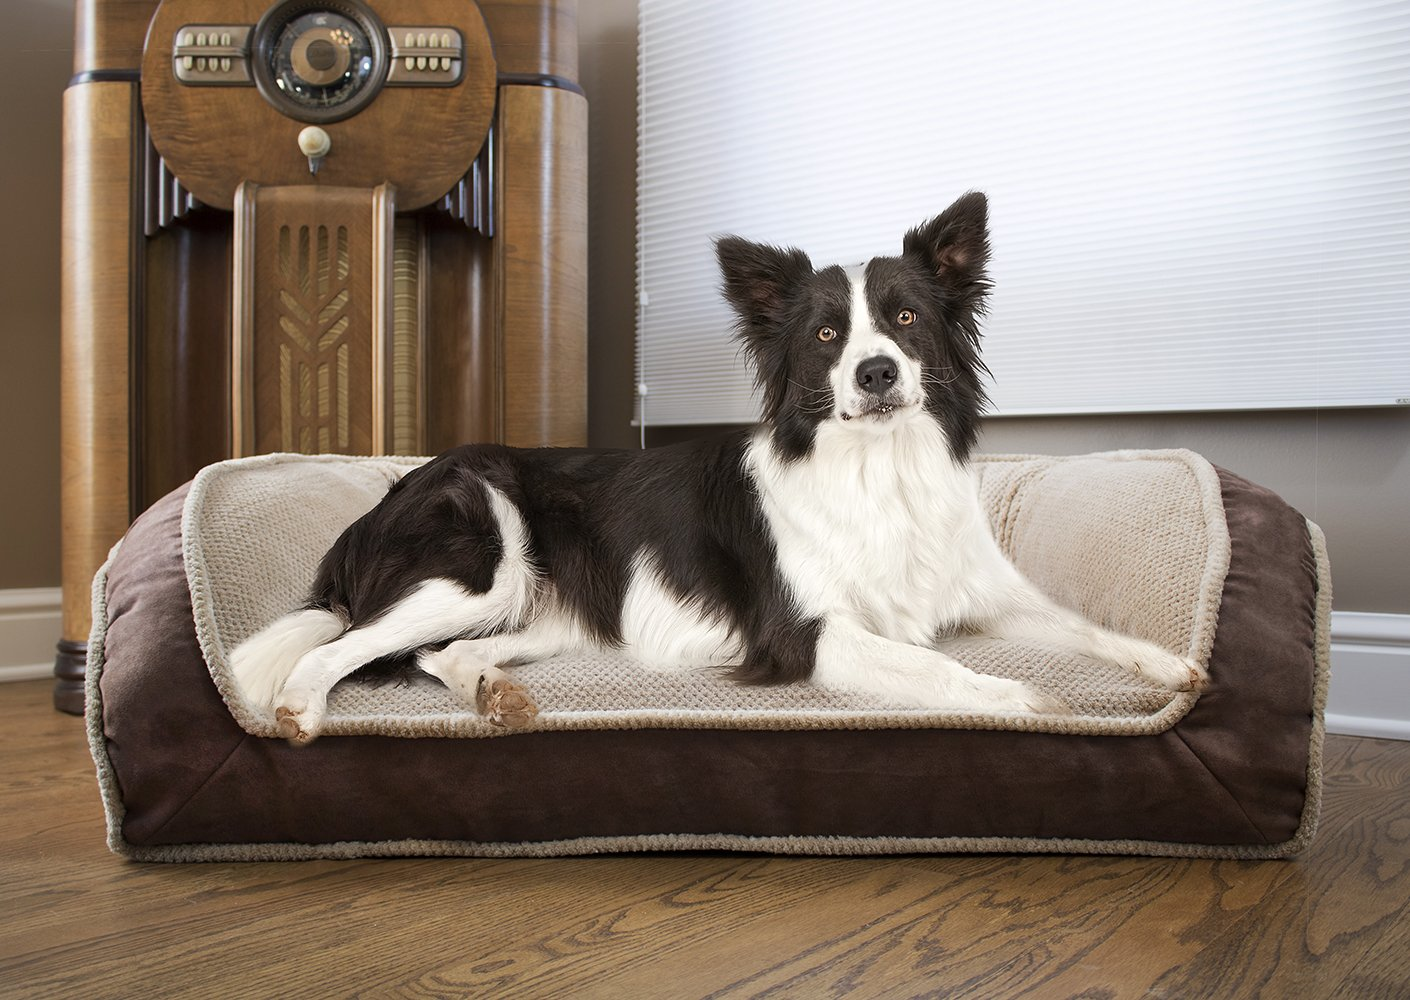 Arlee 59-00998CHO Deep Seated Lounger Sofa Pet Bed, Small/Medium, Chocolate Brown by Arlee